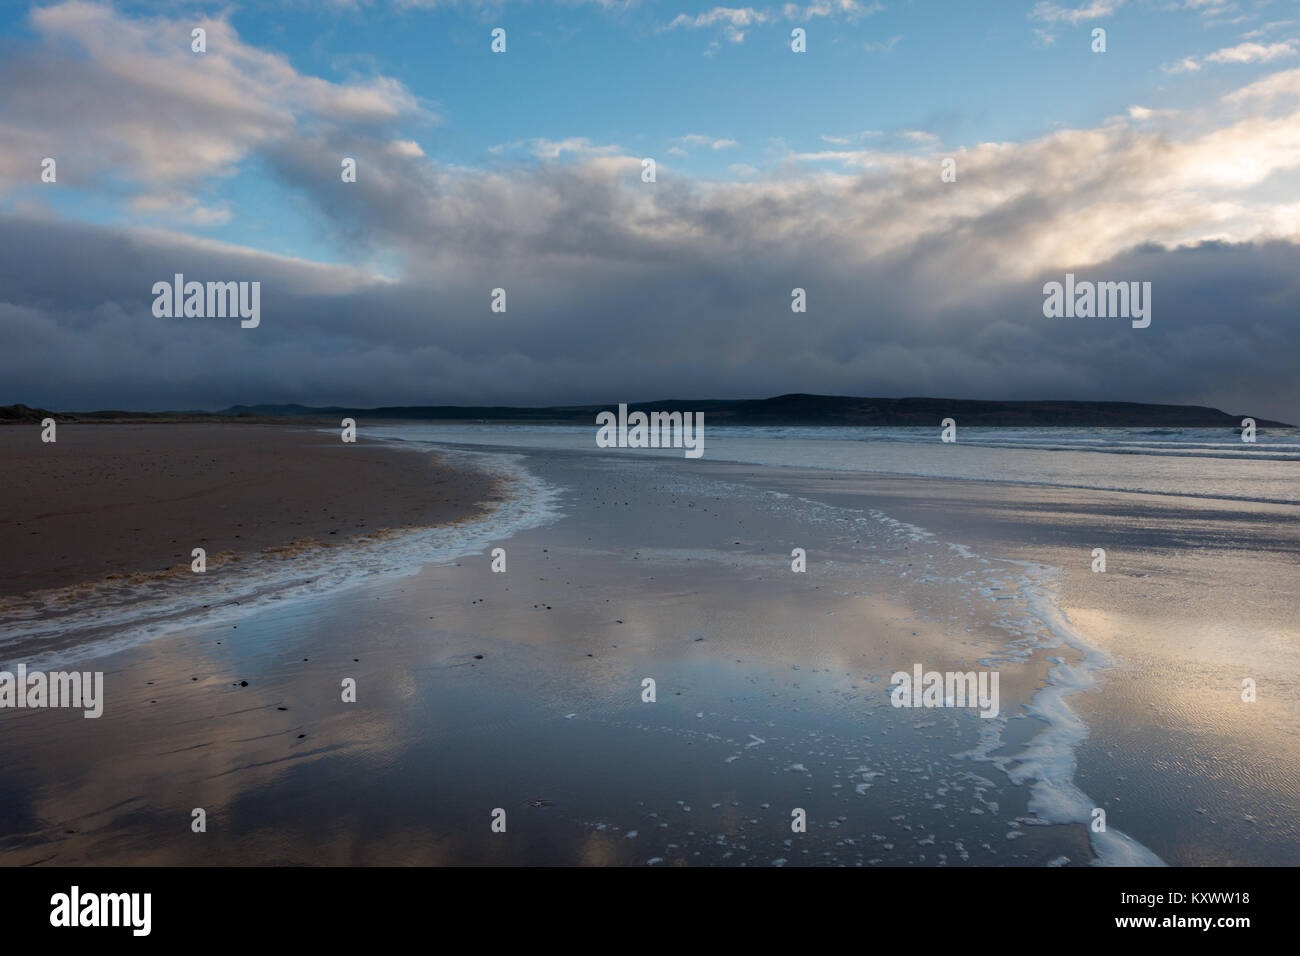 Big Strand beach in beautiful light, Isle of Islay, Scotland - Stock Image